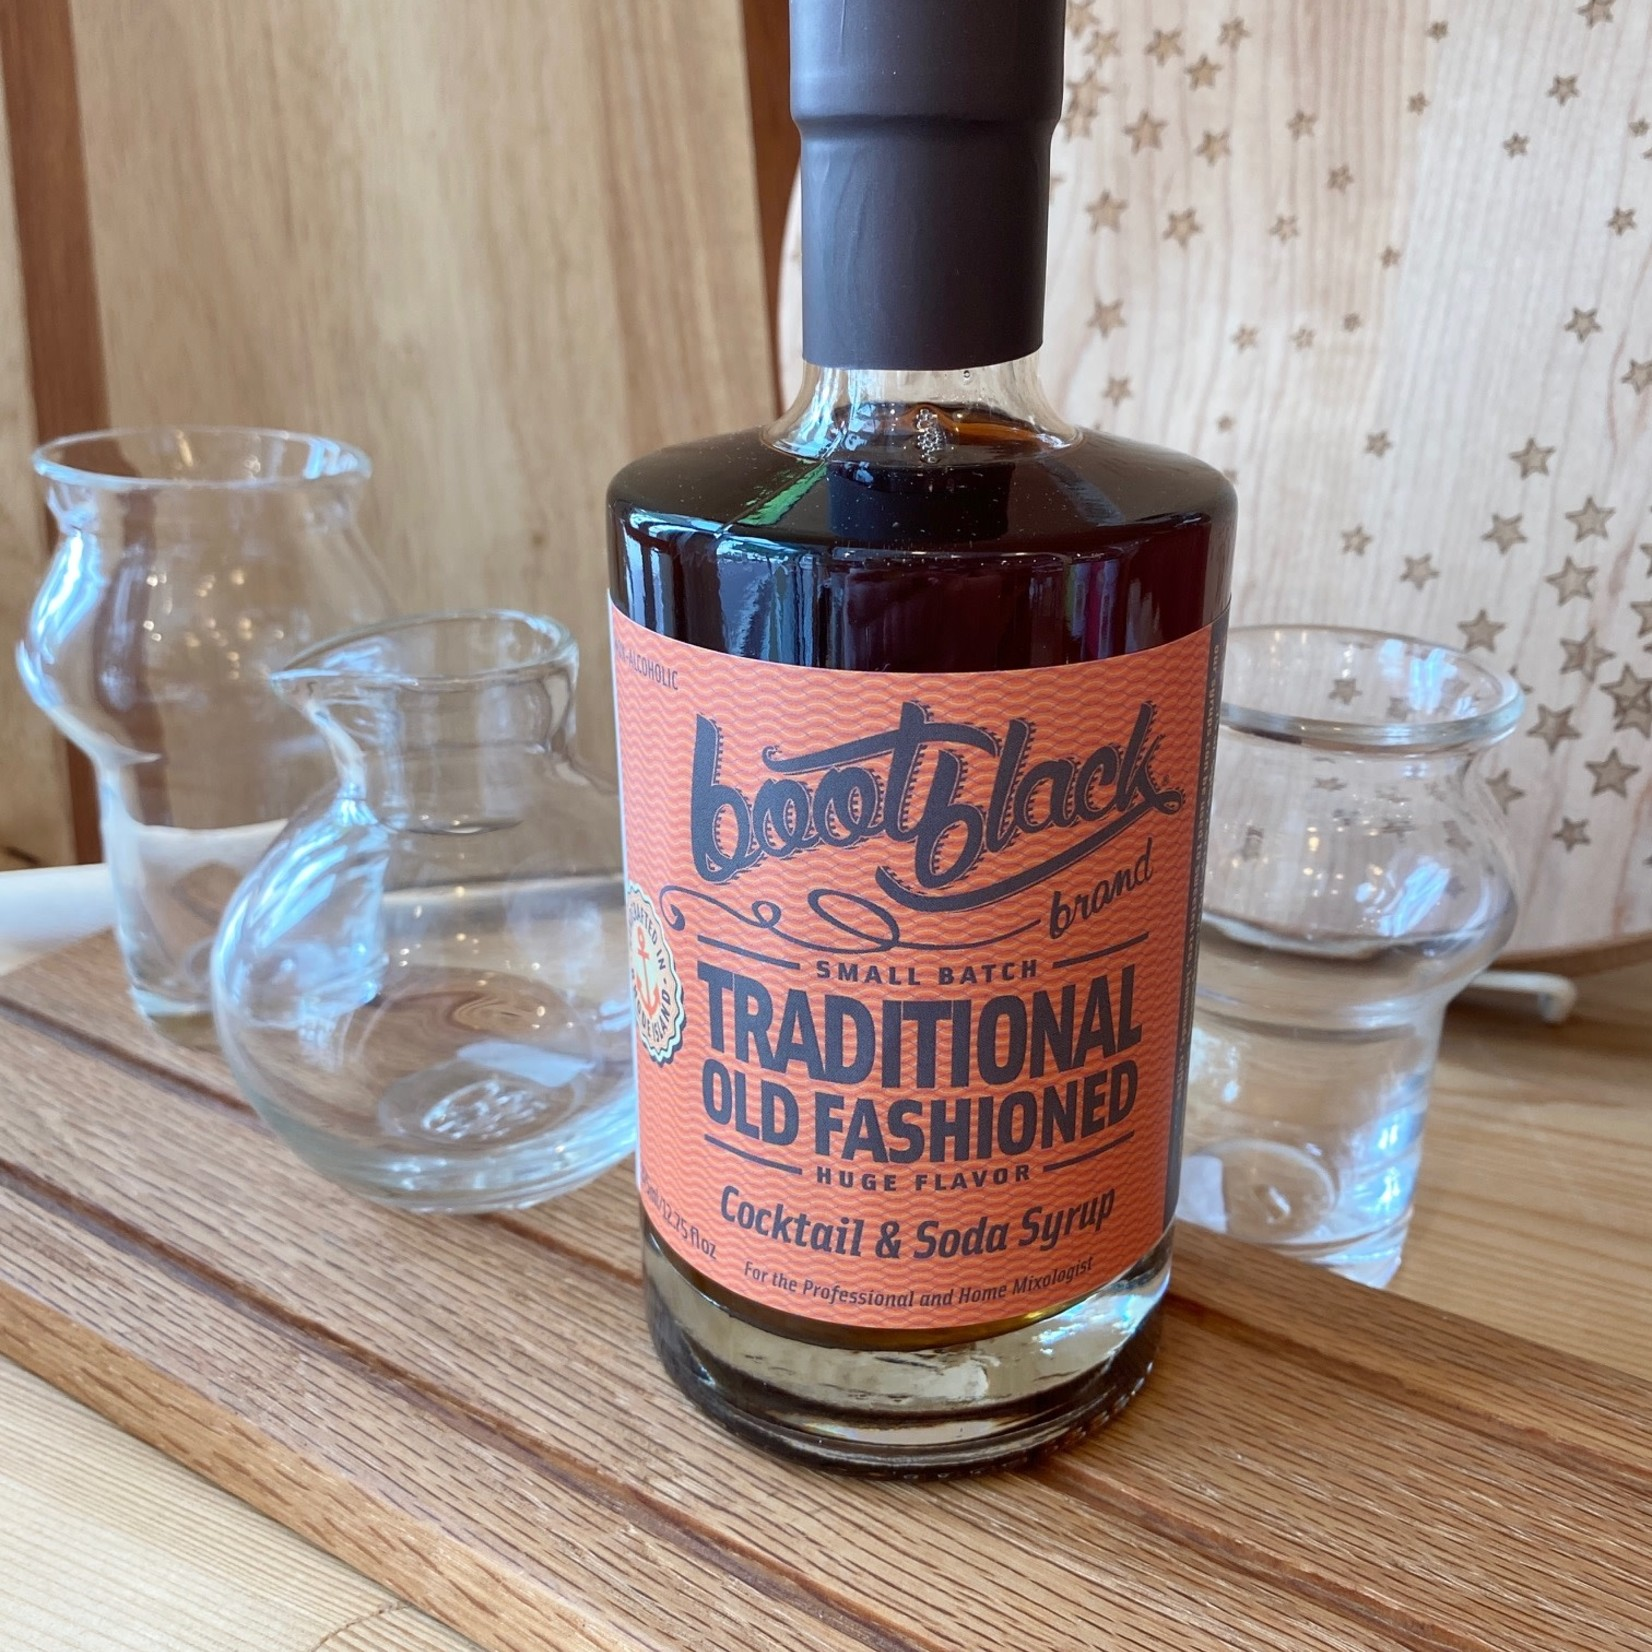 Bootblack Brand Cocktail + Soda Syrups